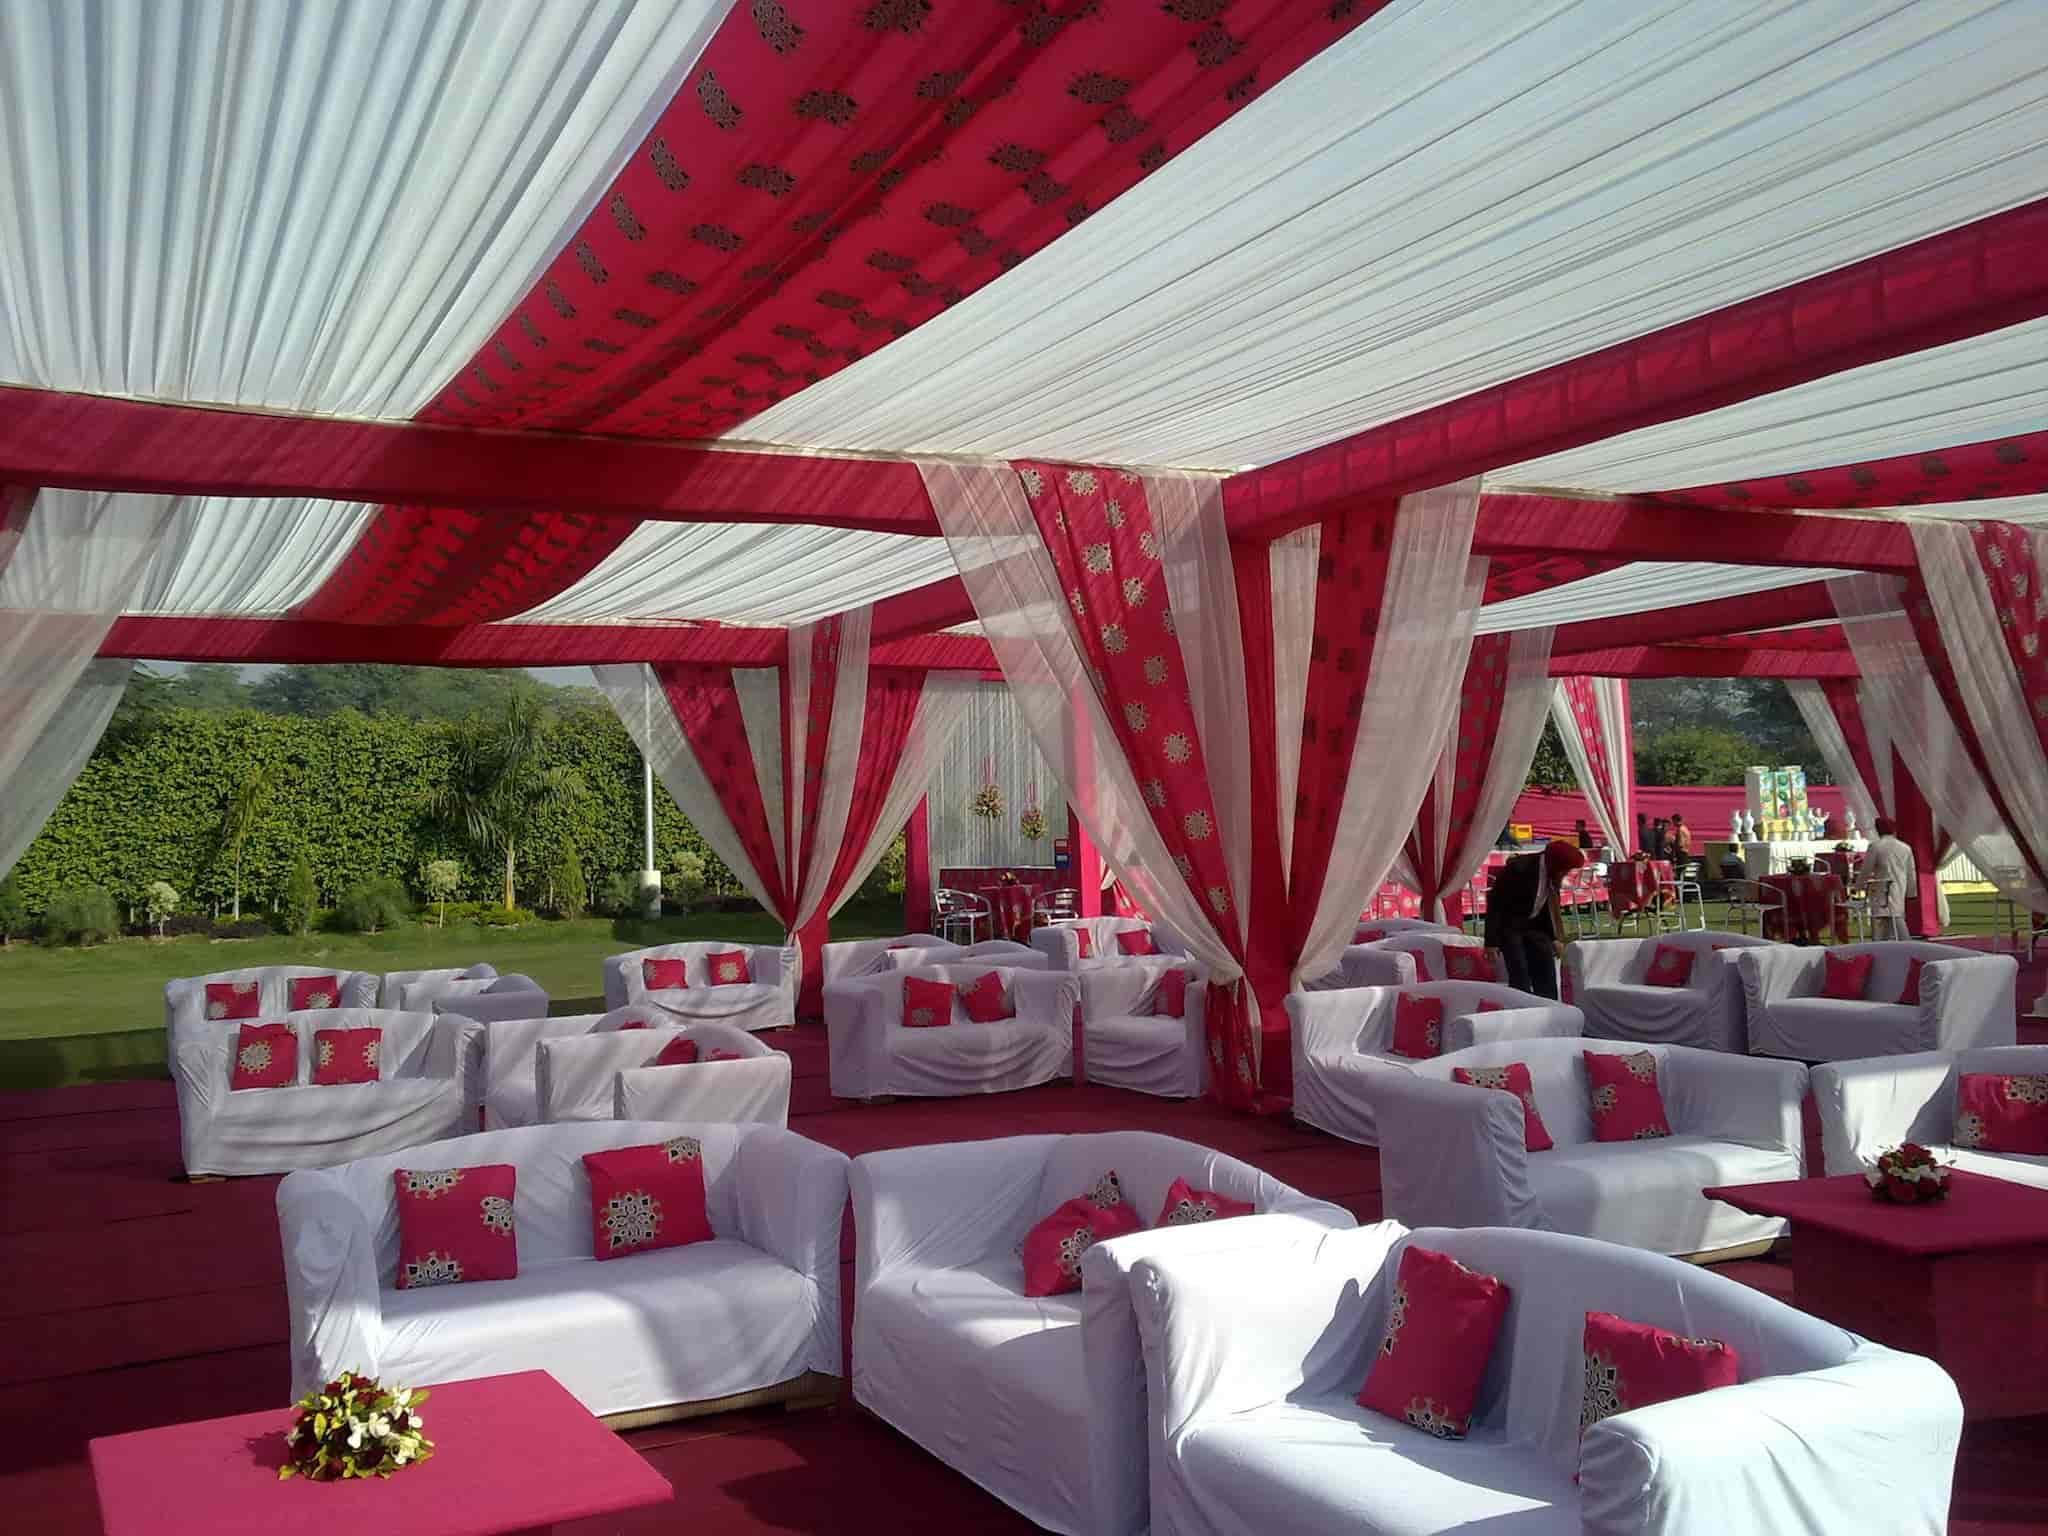 New Punjab Tent Decorators Photos Sector 27c Chandigarh Pictures